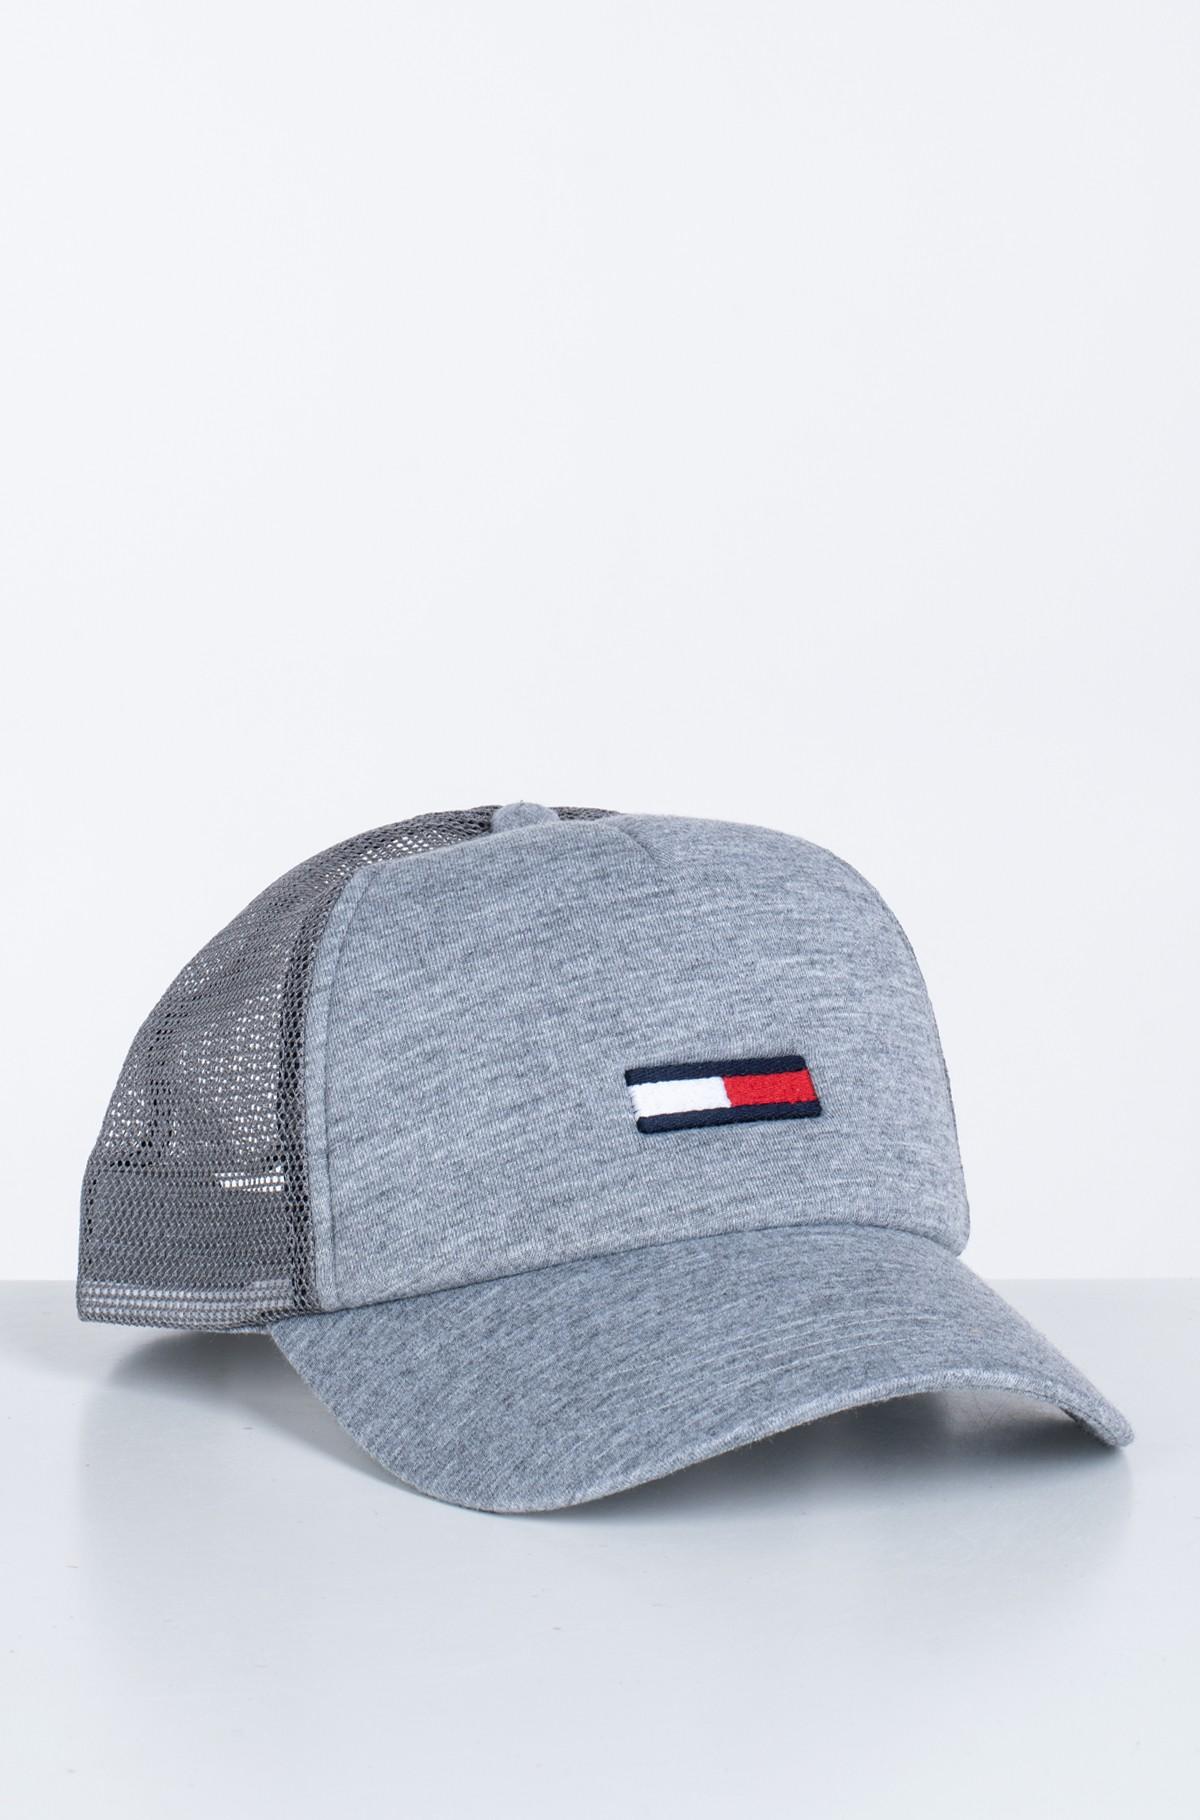 Nokamüts TJM TRUCKER CAP JERSEY-full-1